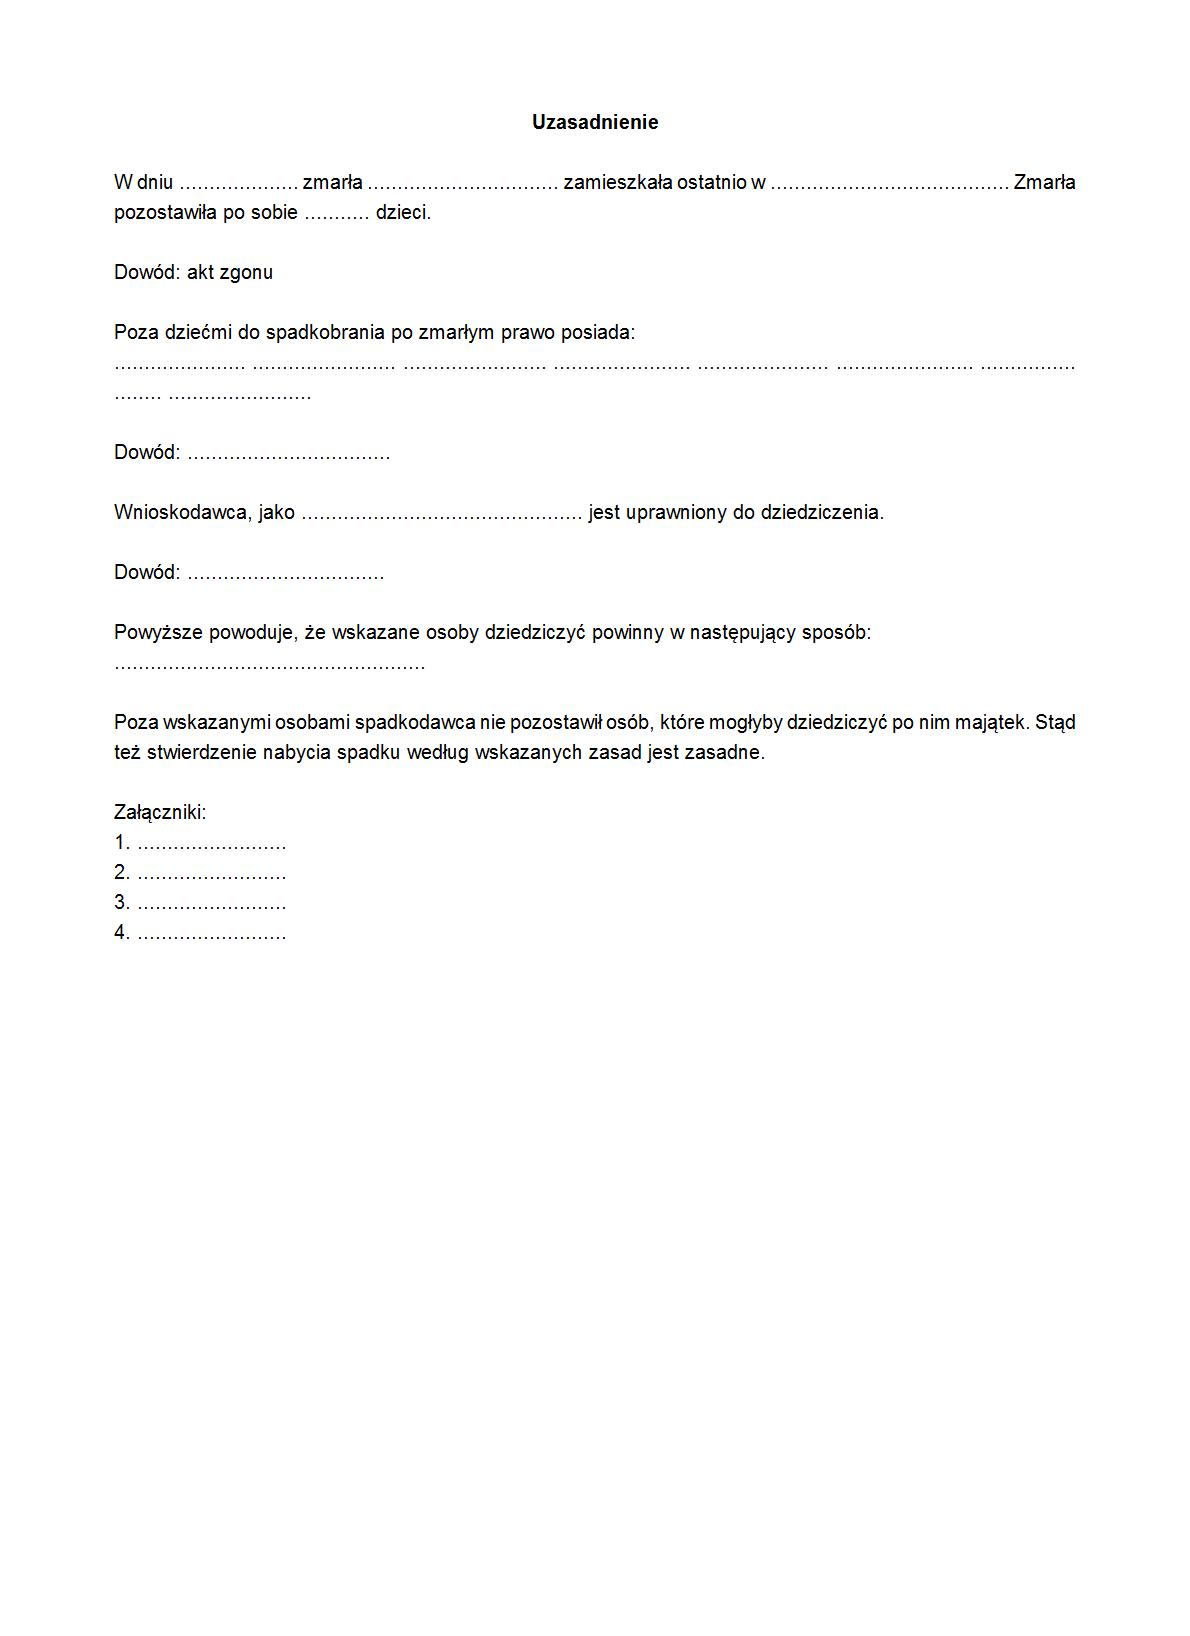 Pit 28 formularz online dating 5